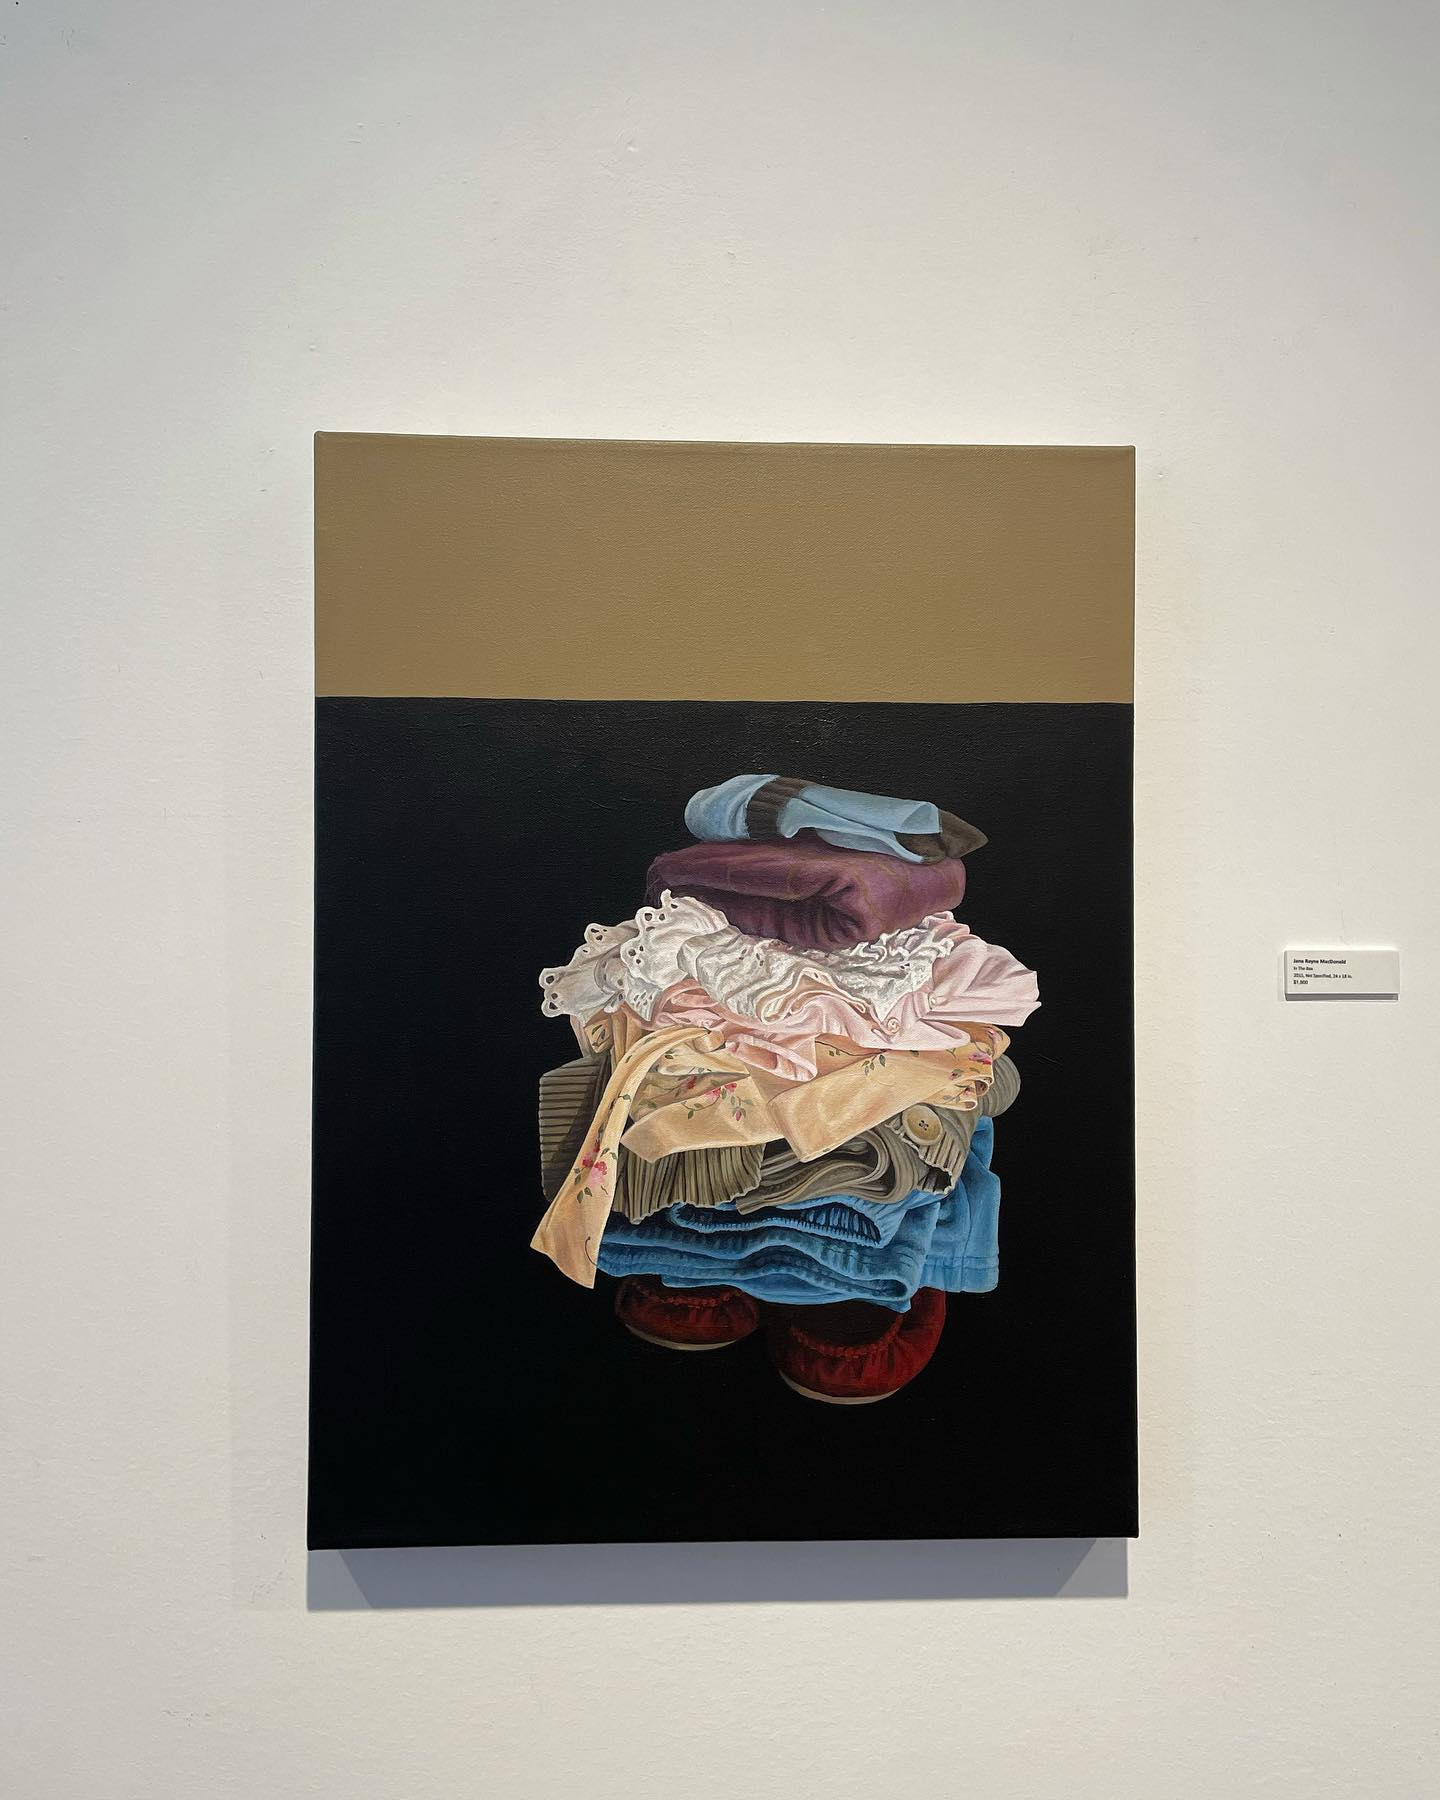 Jana-Rayne-MacDonald-In-The-Box-24x18-Online-Art-Galleries-front